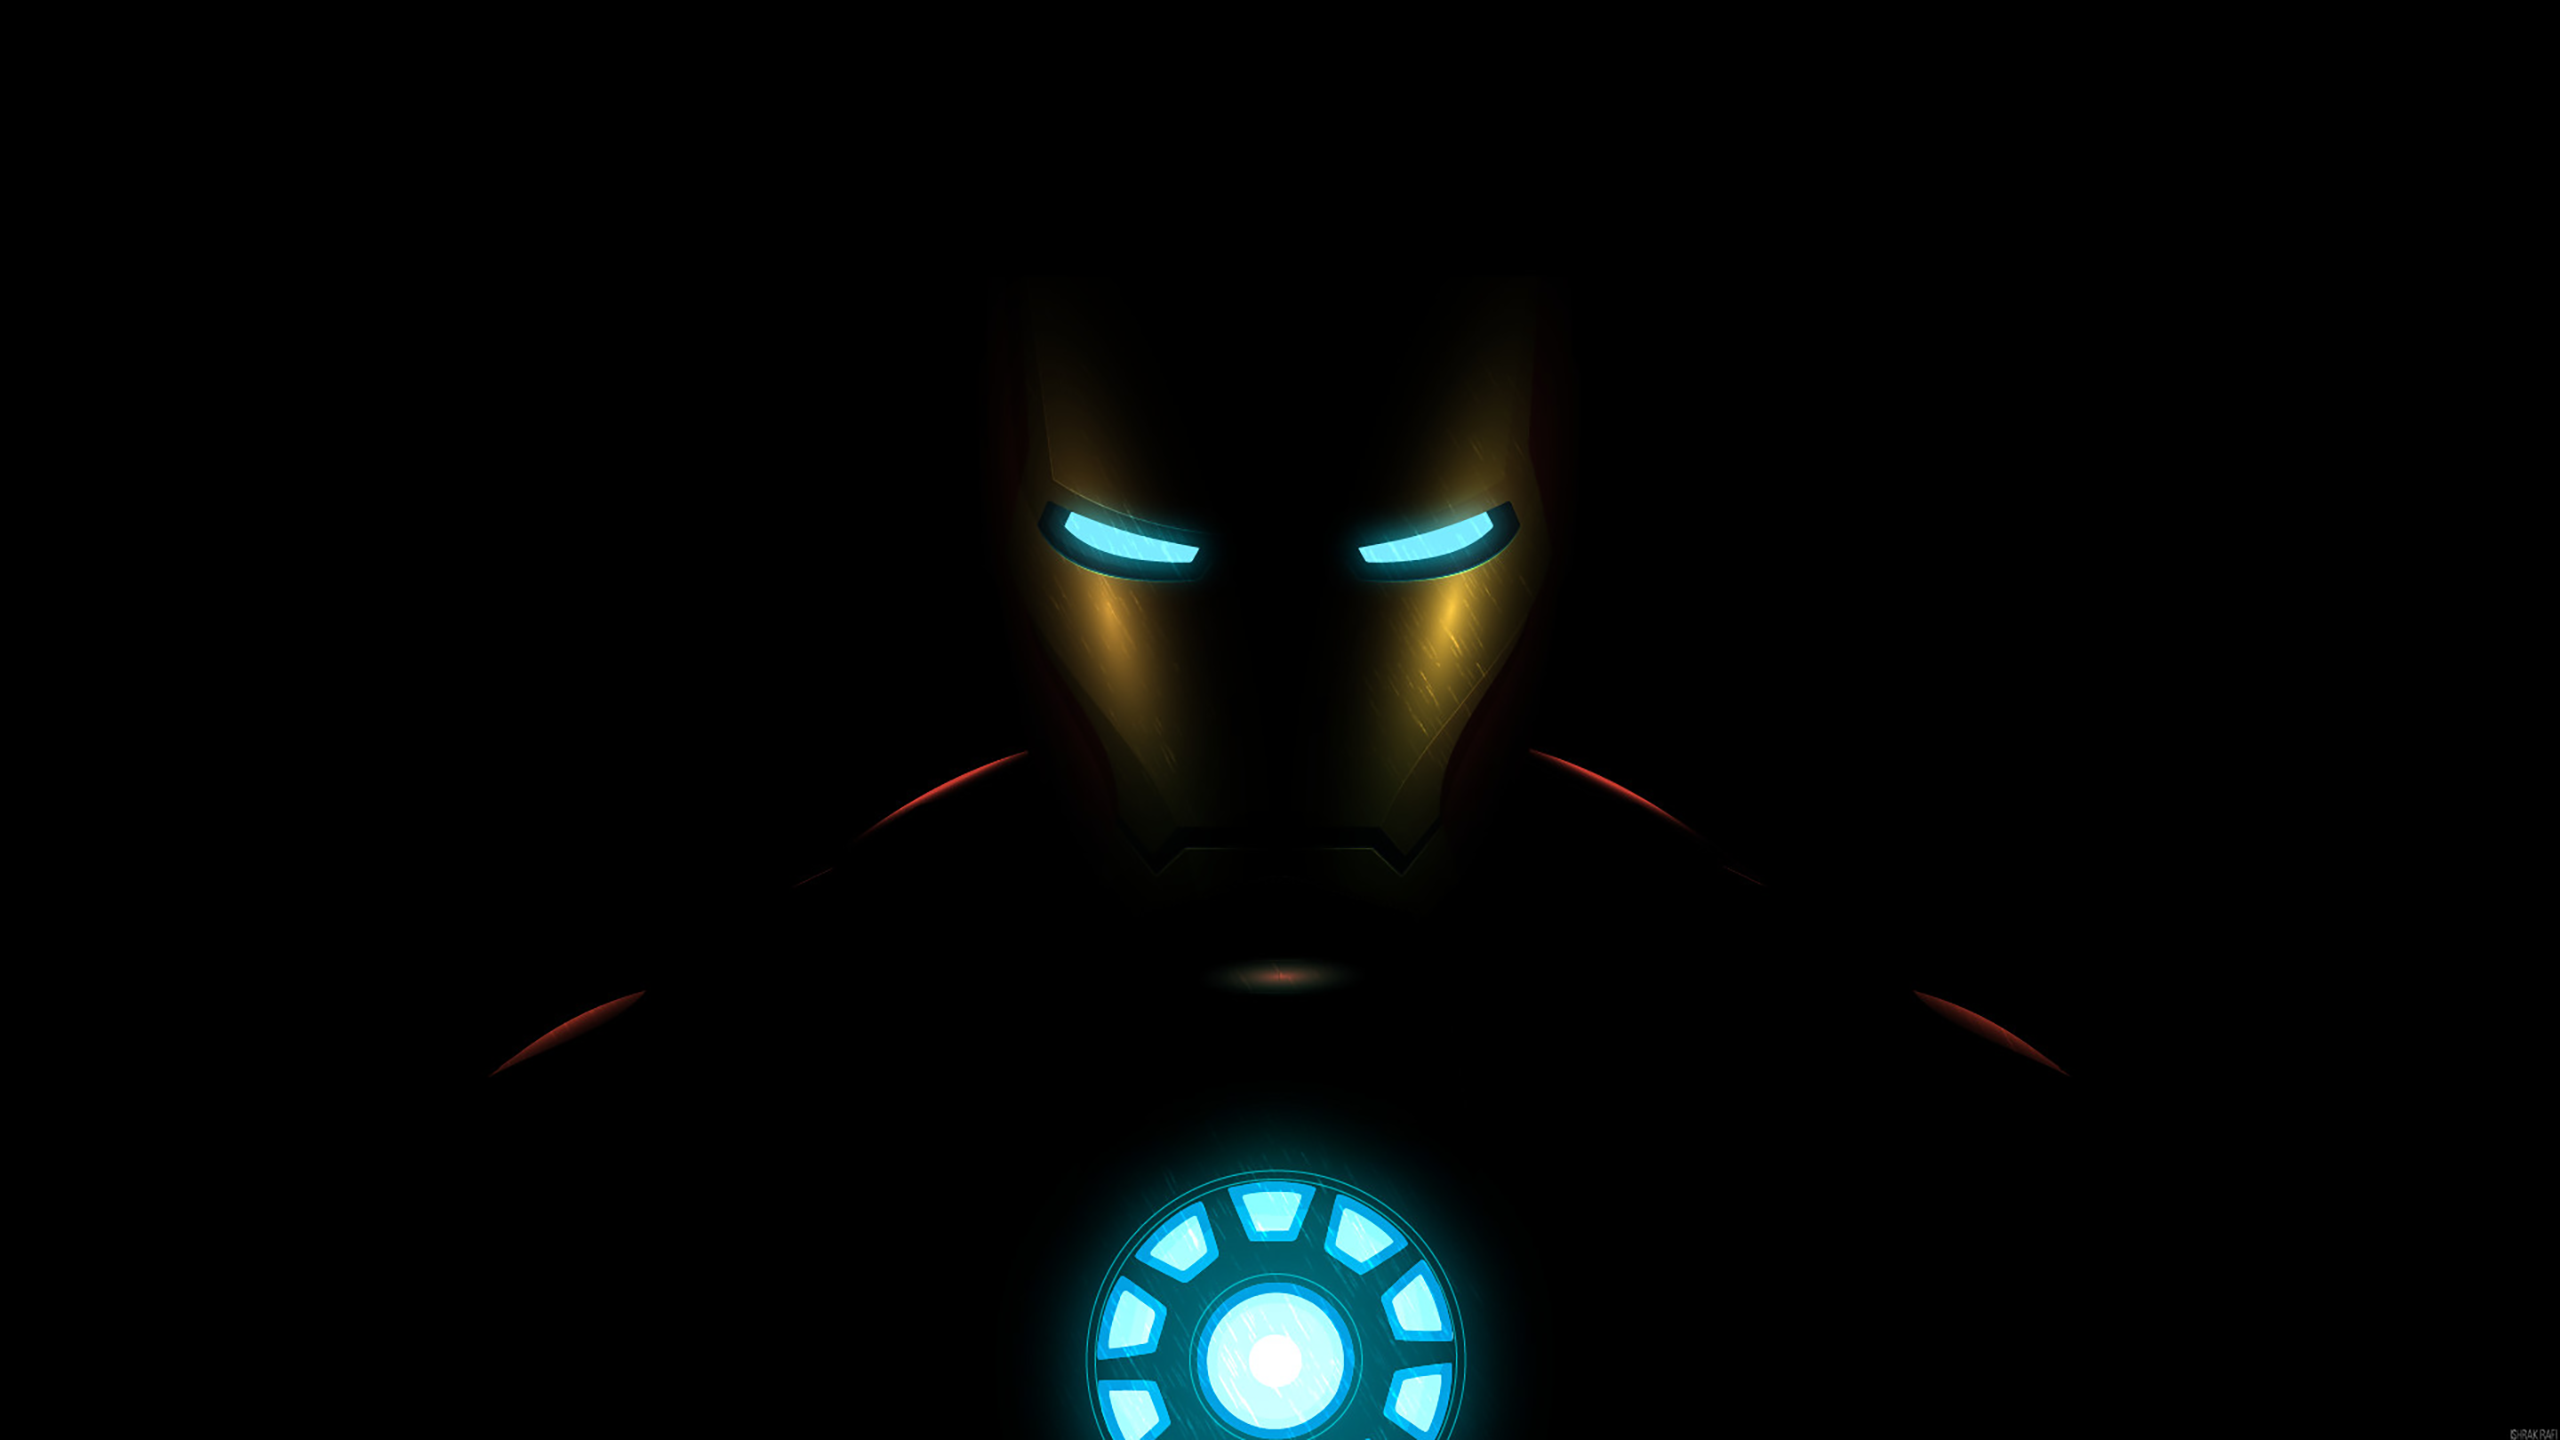 Iron Man Black Desktop Wallpapers - Top